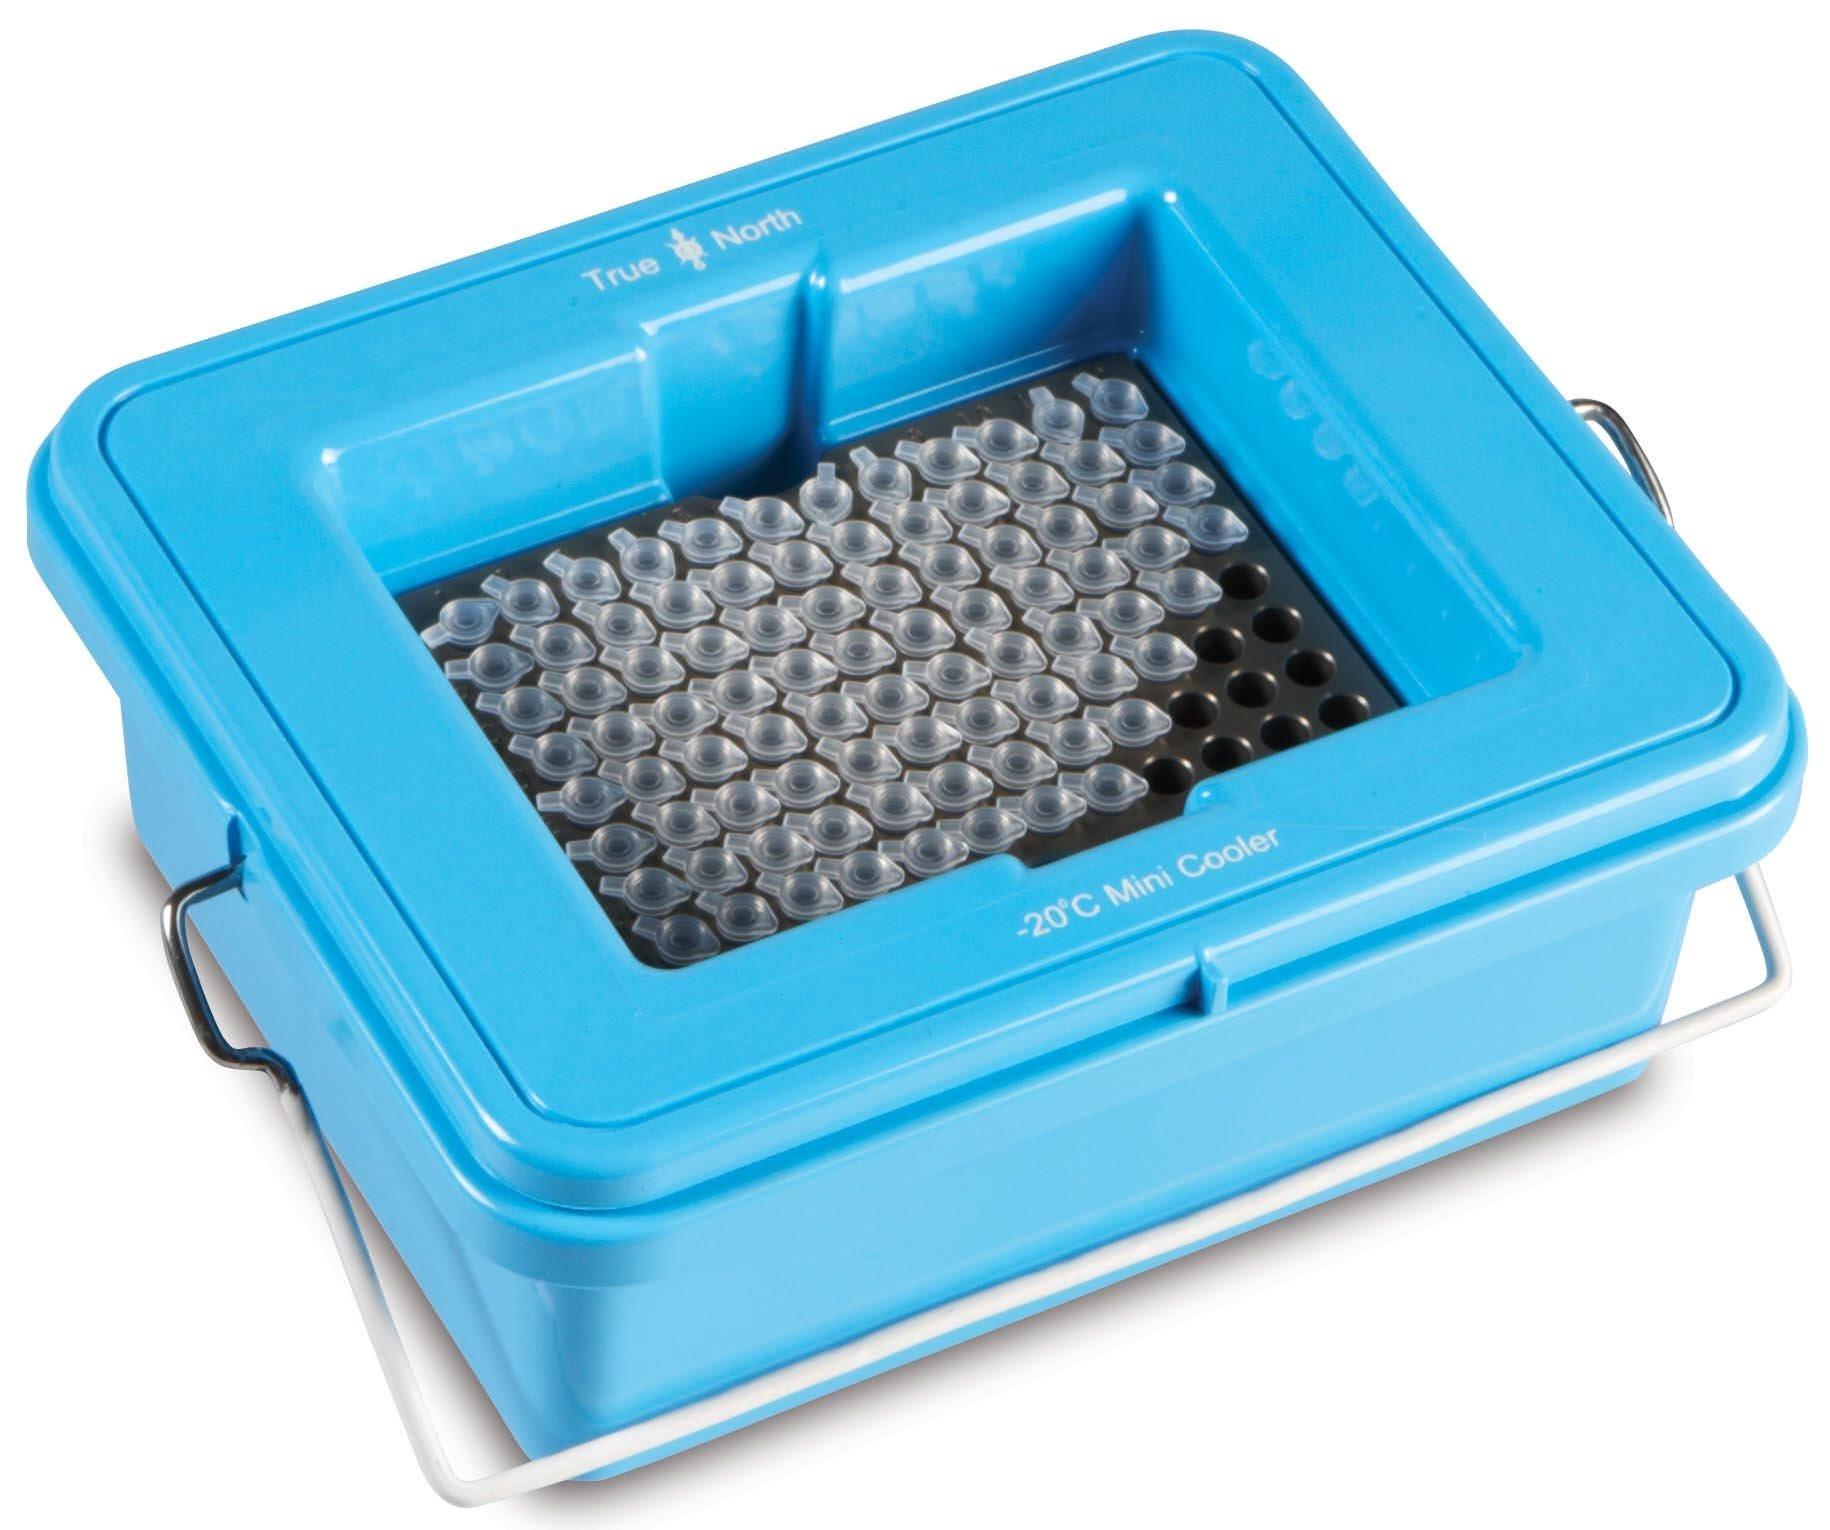 True North Blue Mini Cooler -20 Degrees C - Clear Lid - 96 x 0.2 mL